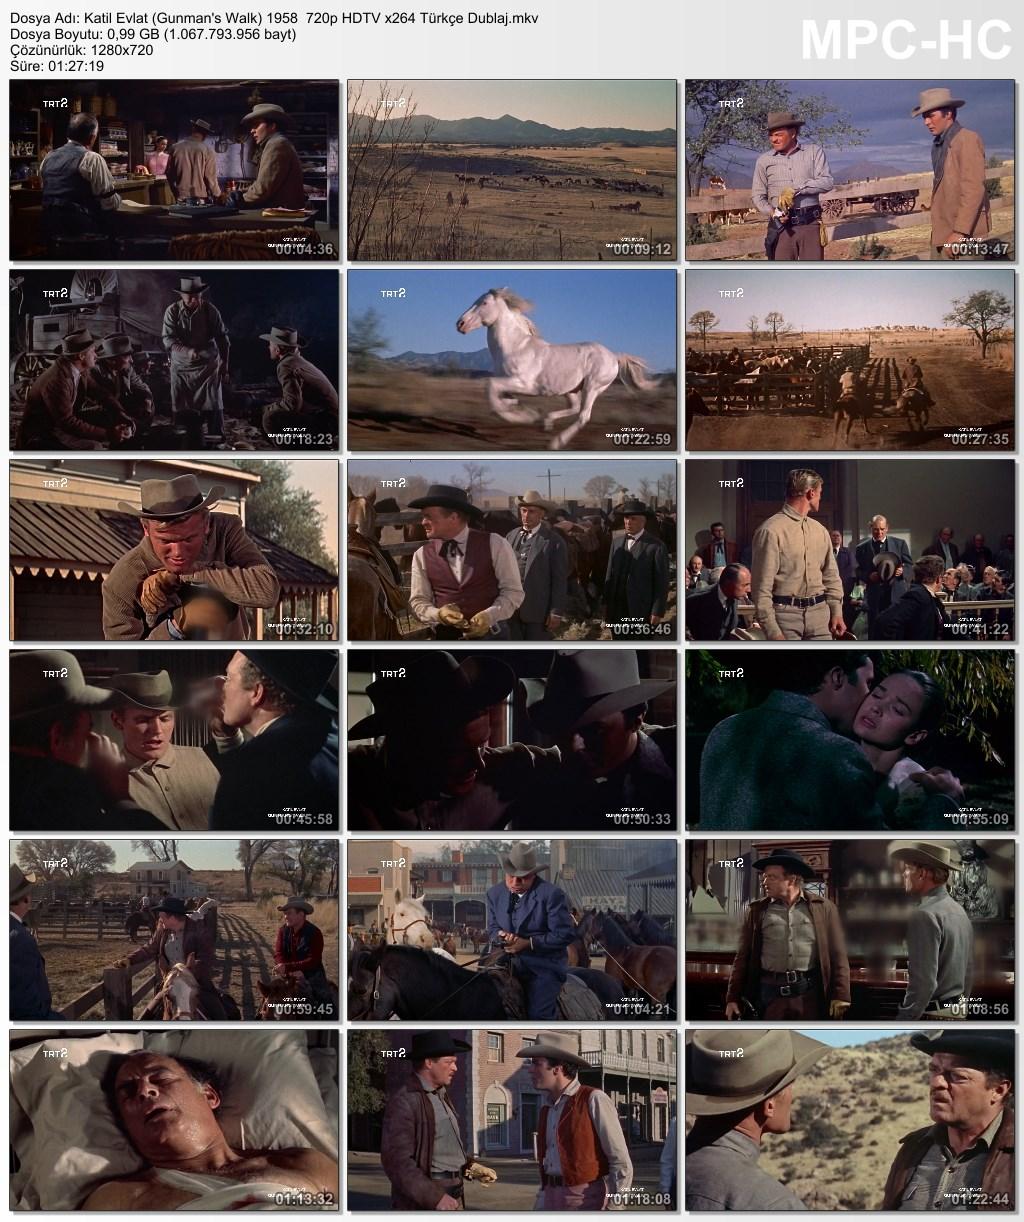 Katil Evlat (Gunman's Walk) 1958  720p HDTV x264 Türkçe Dublaj - barbarus